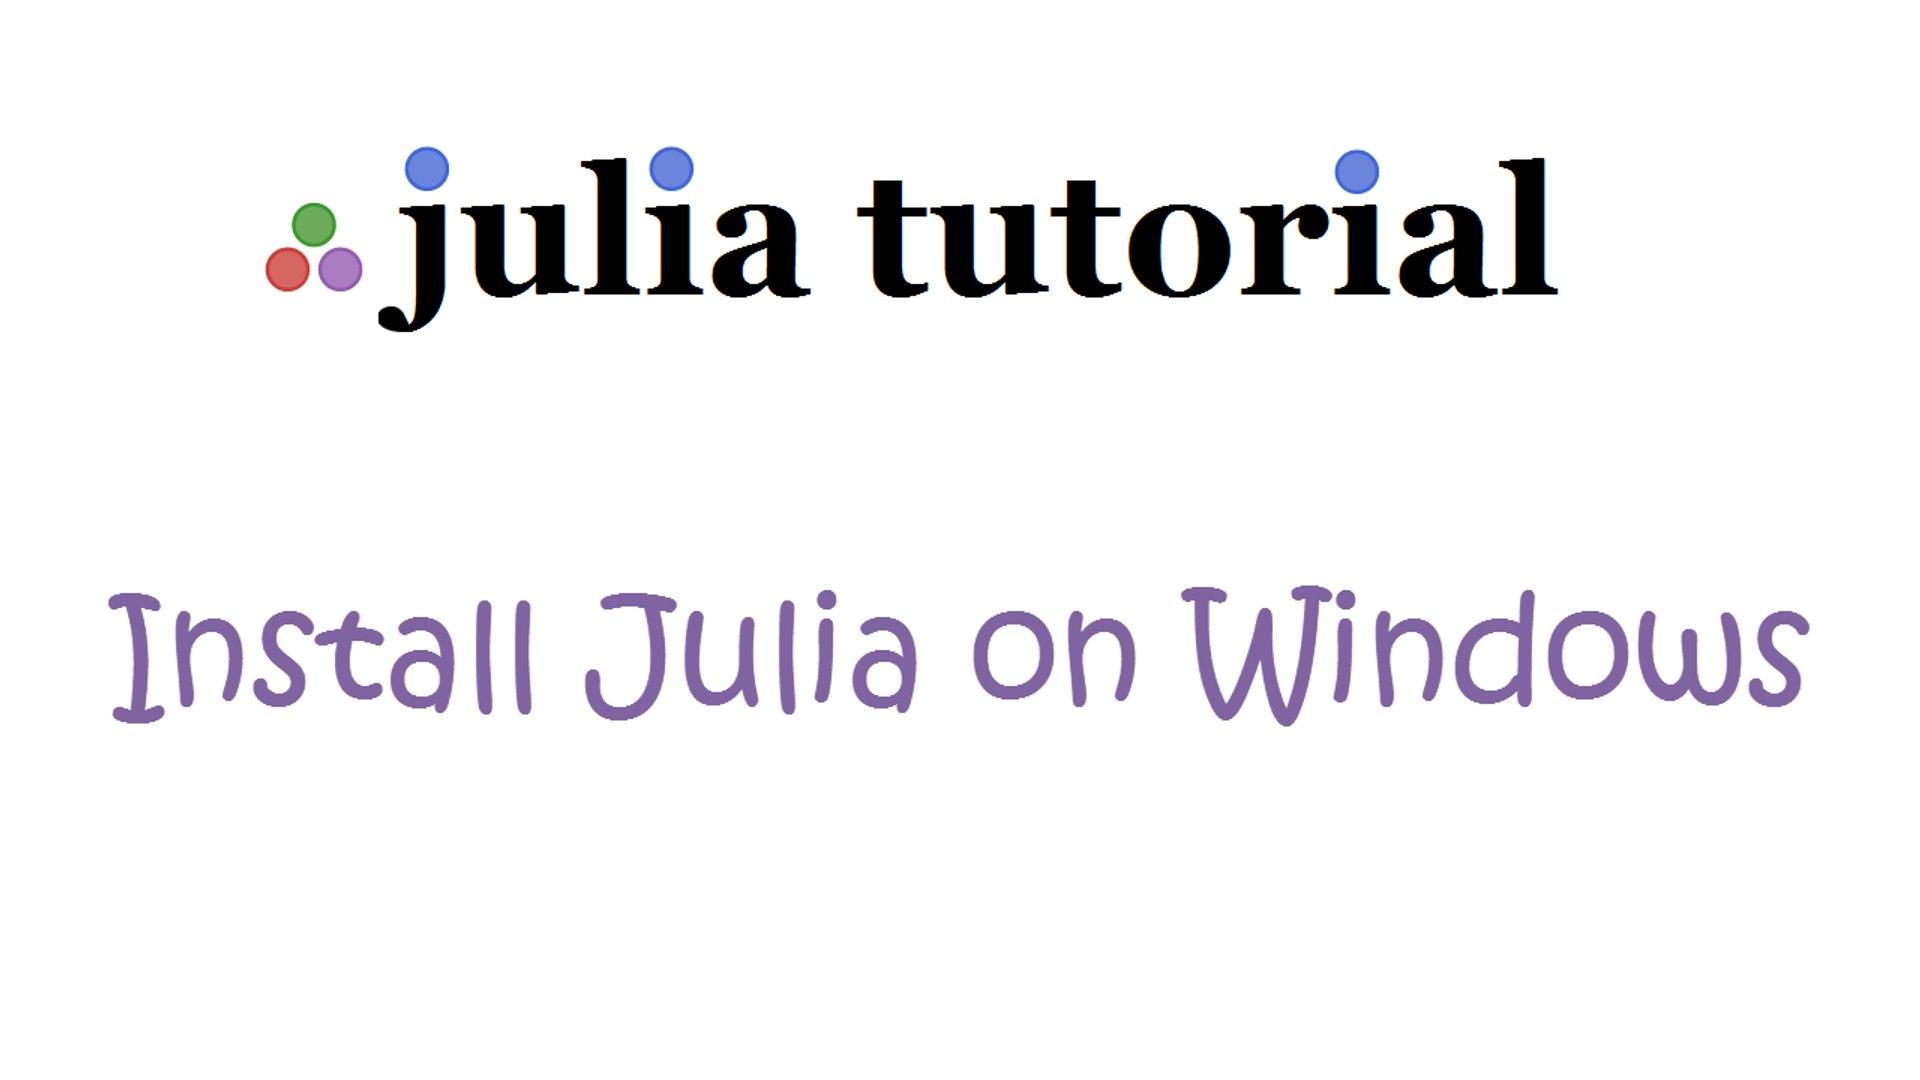 Julia Tutorial - How to install Julia on Windows